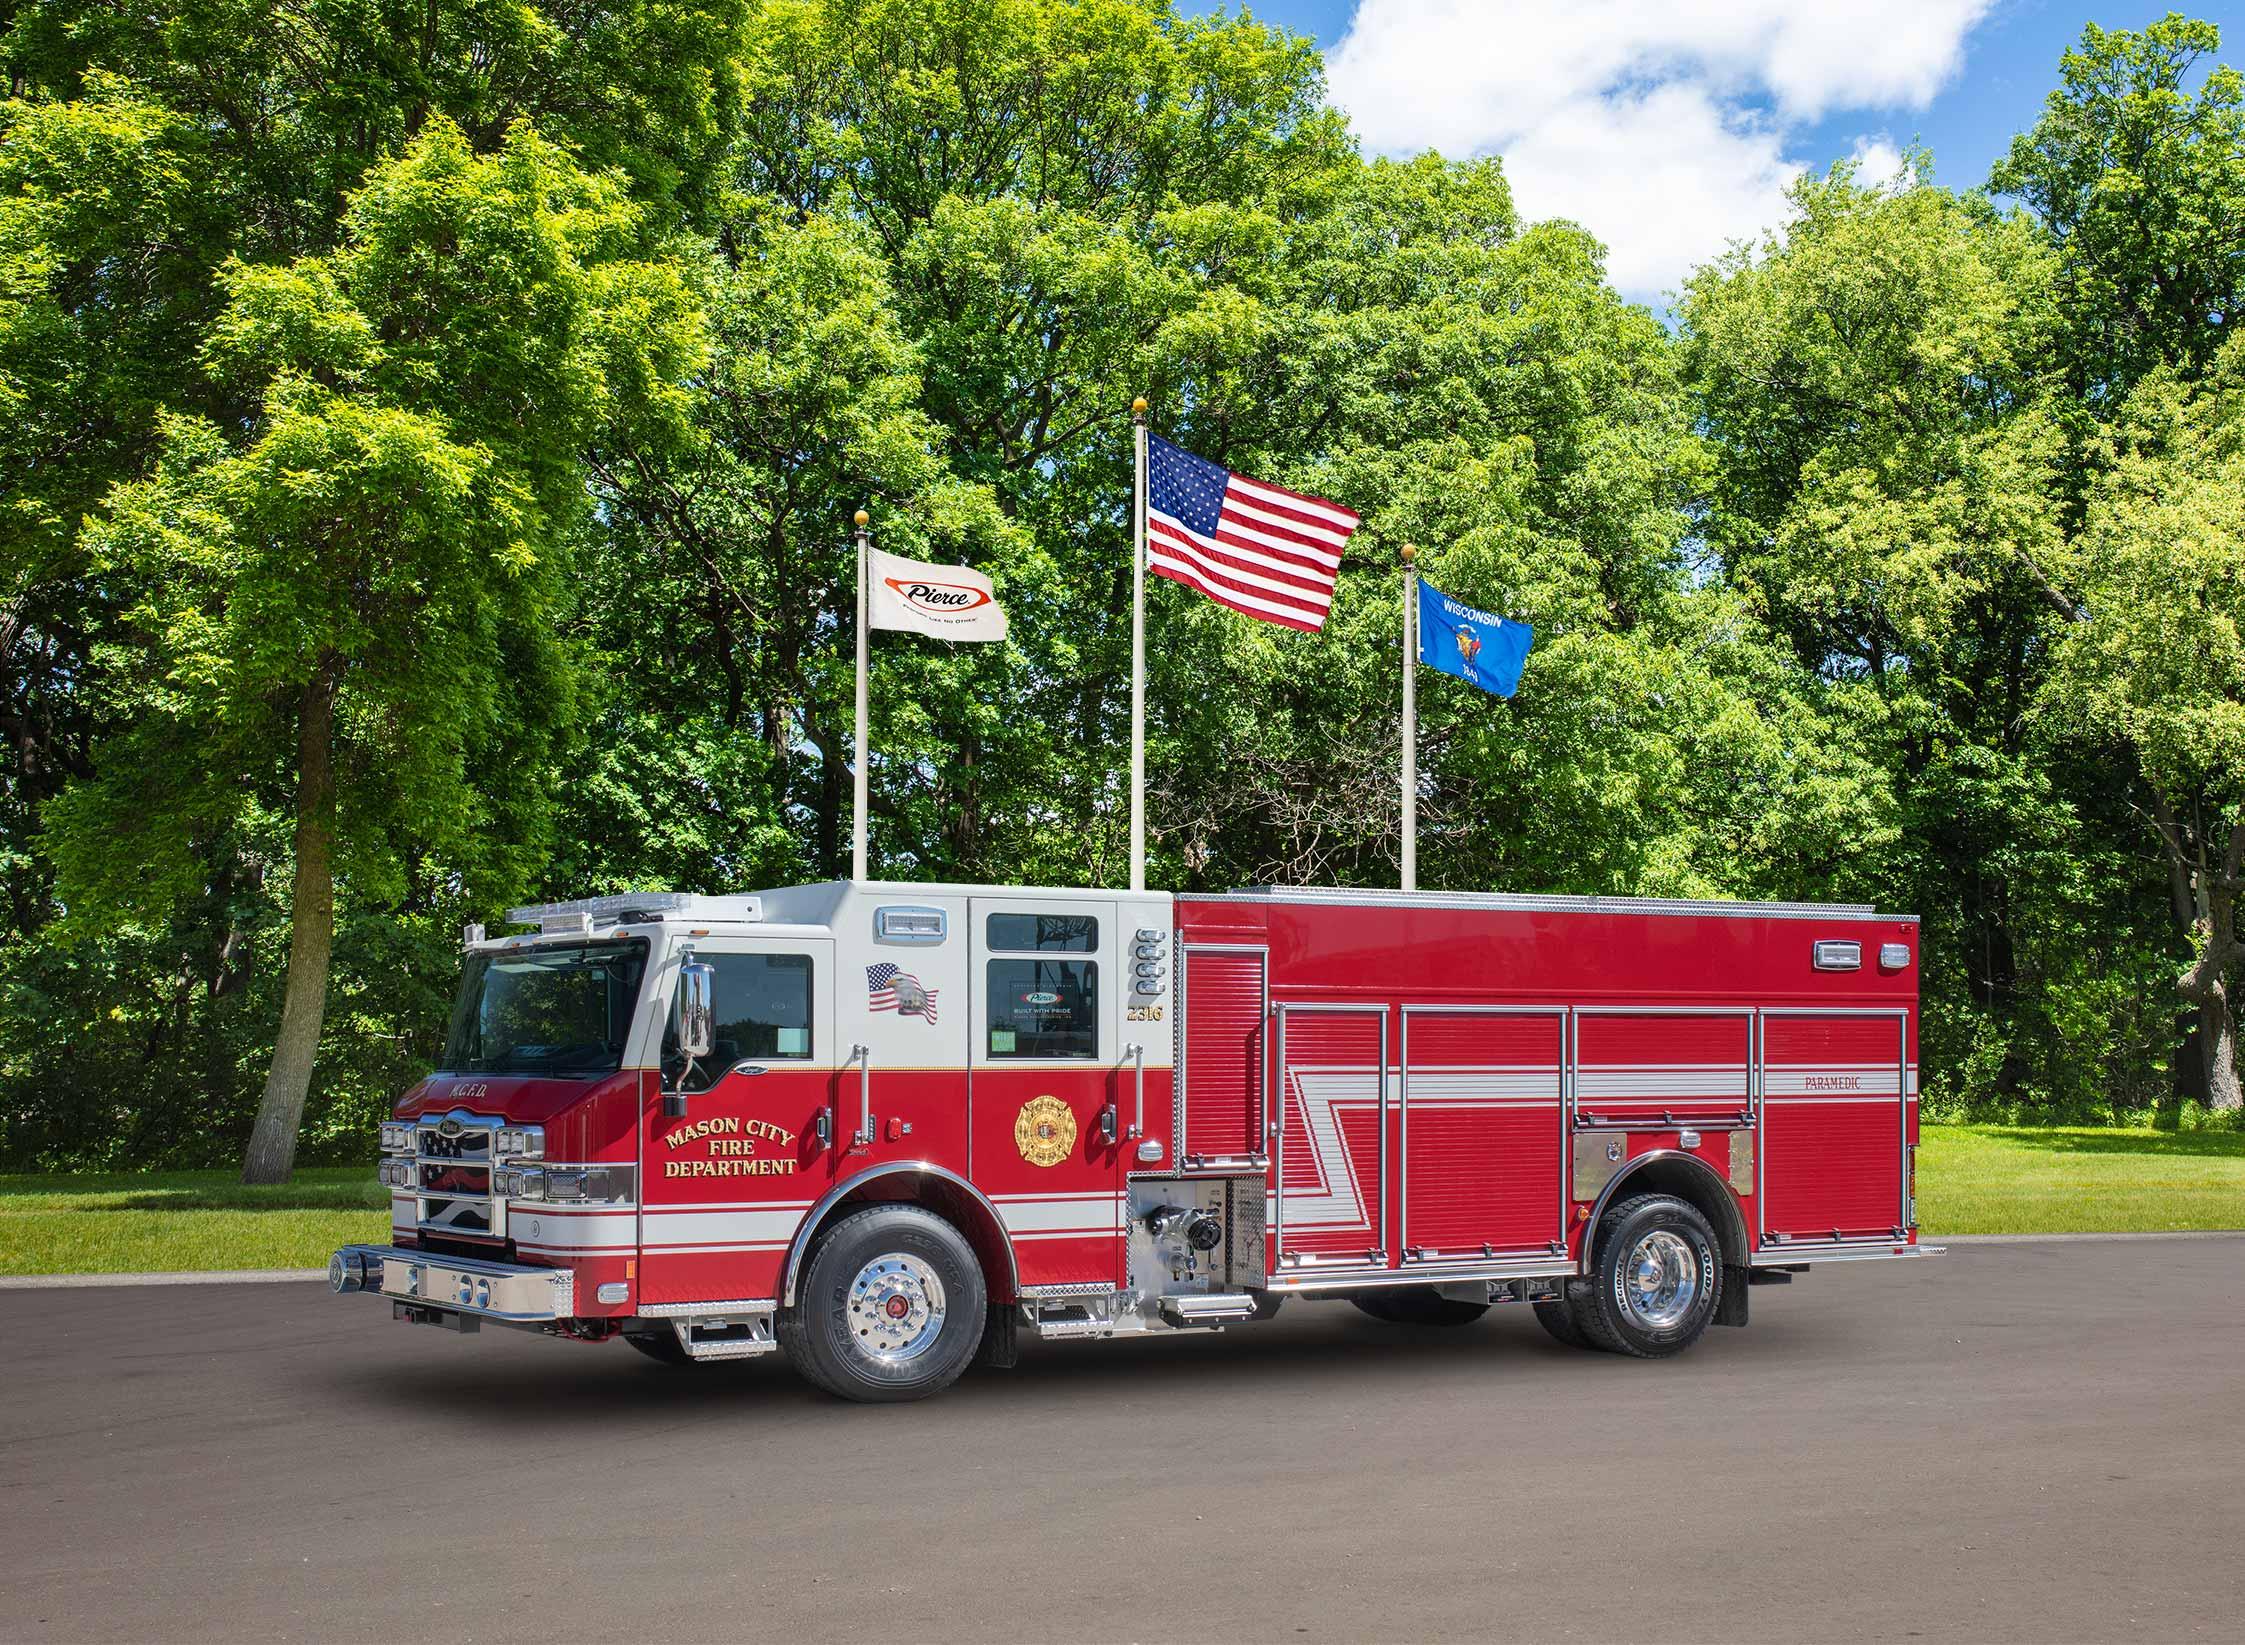 Mason City Iowa Fire Department - Pumper